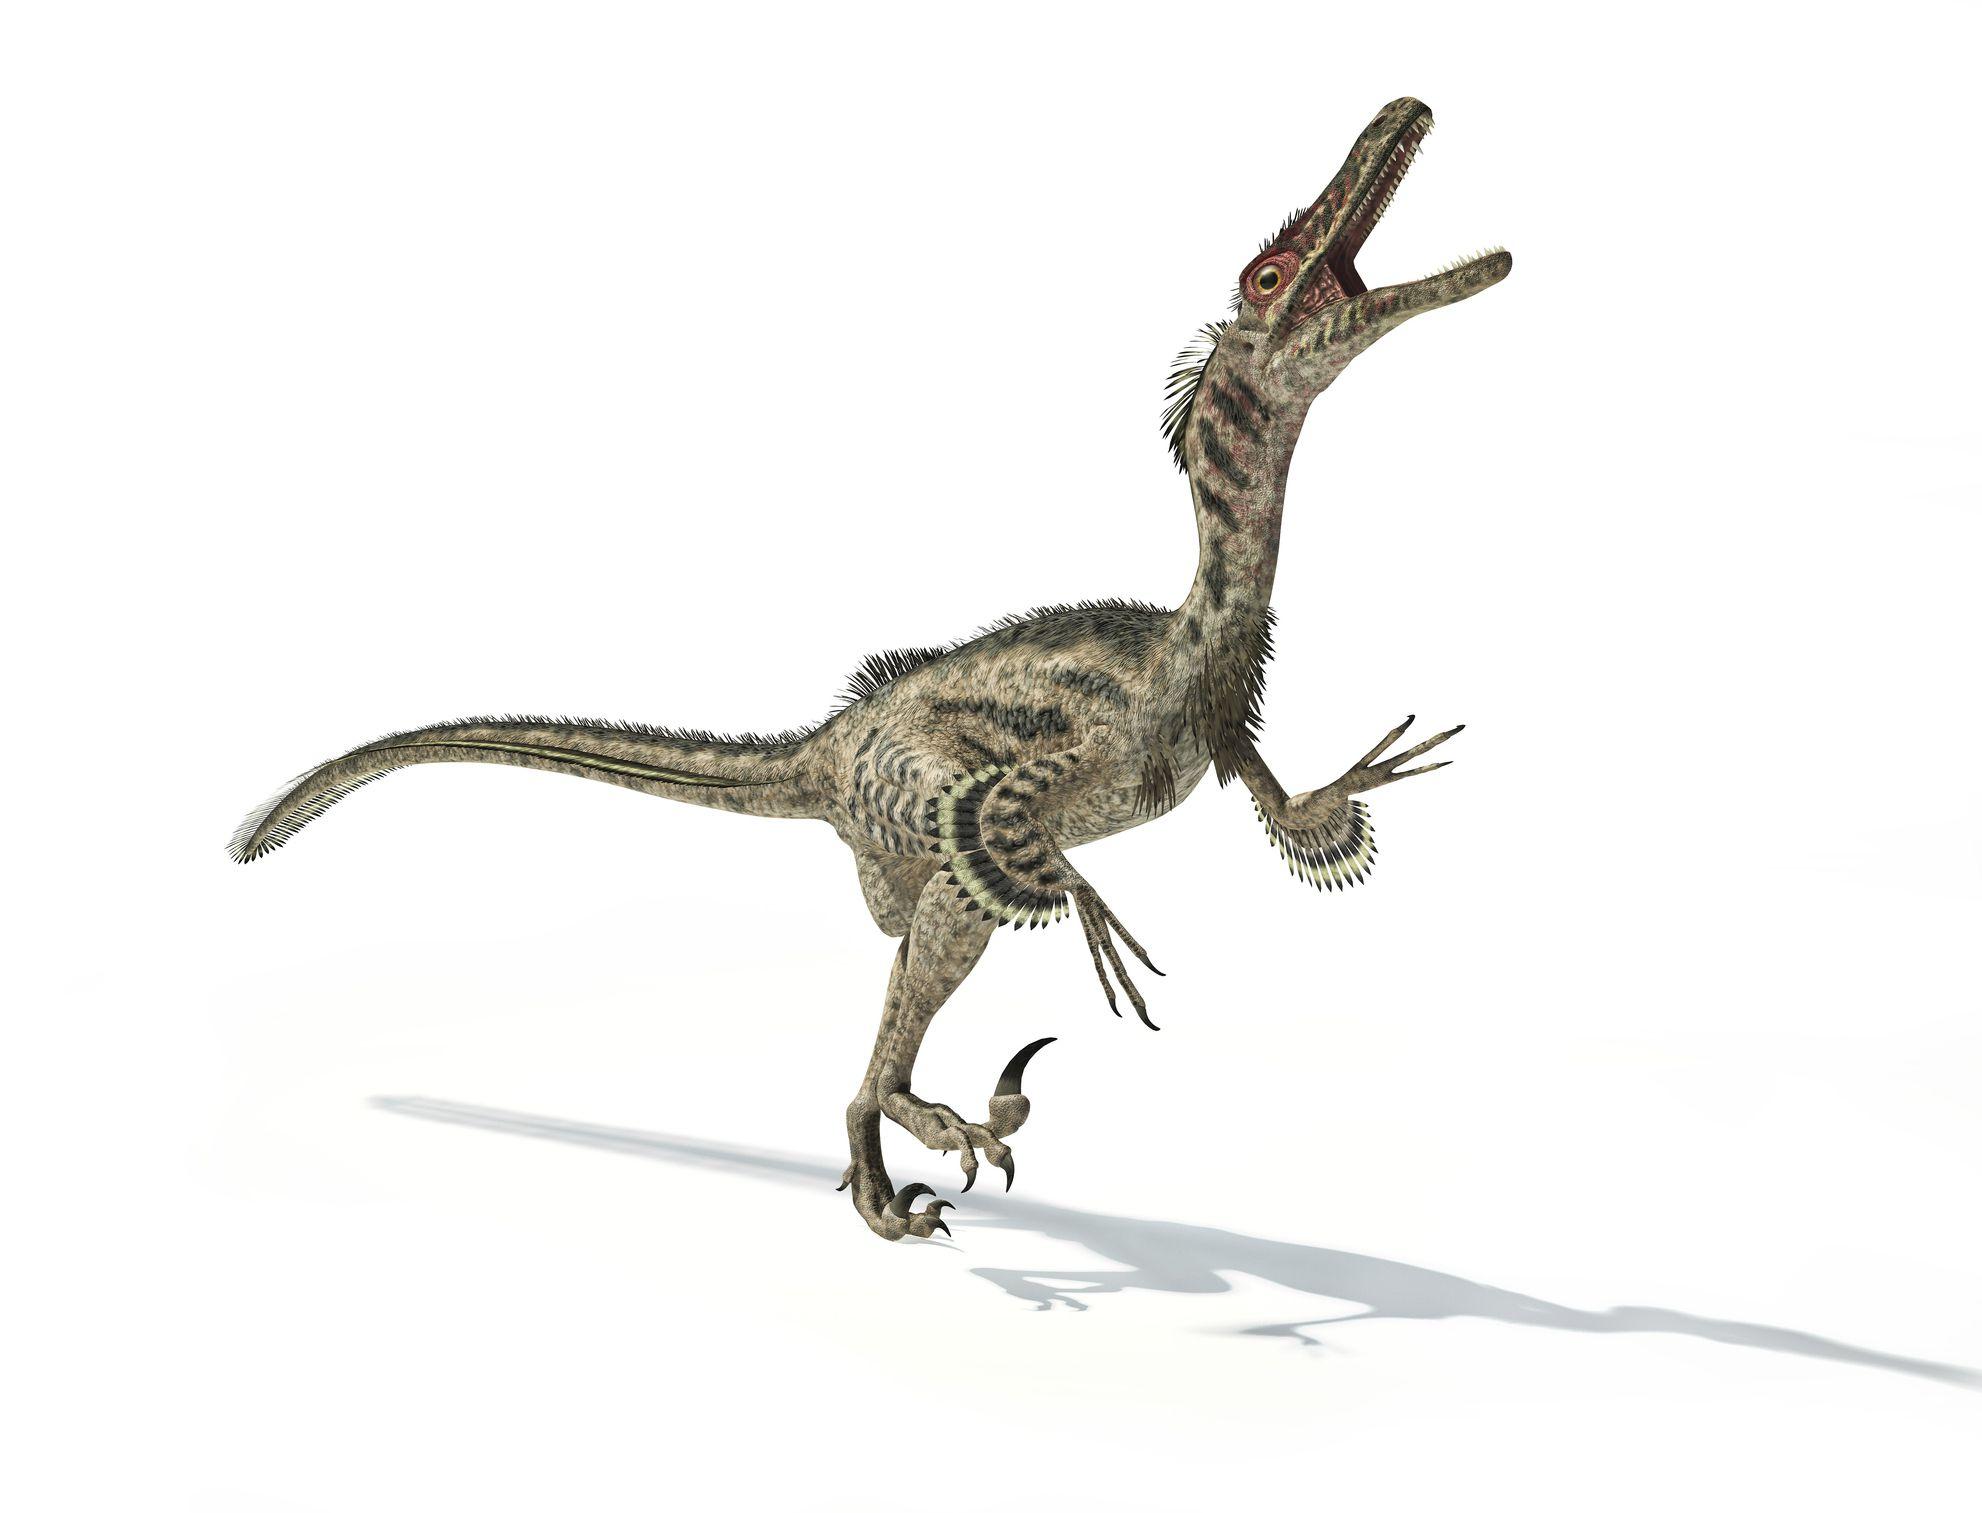 Asian dinosaur